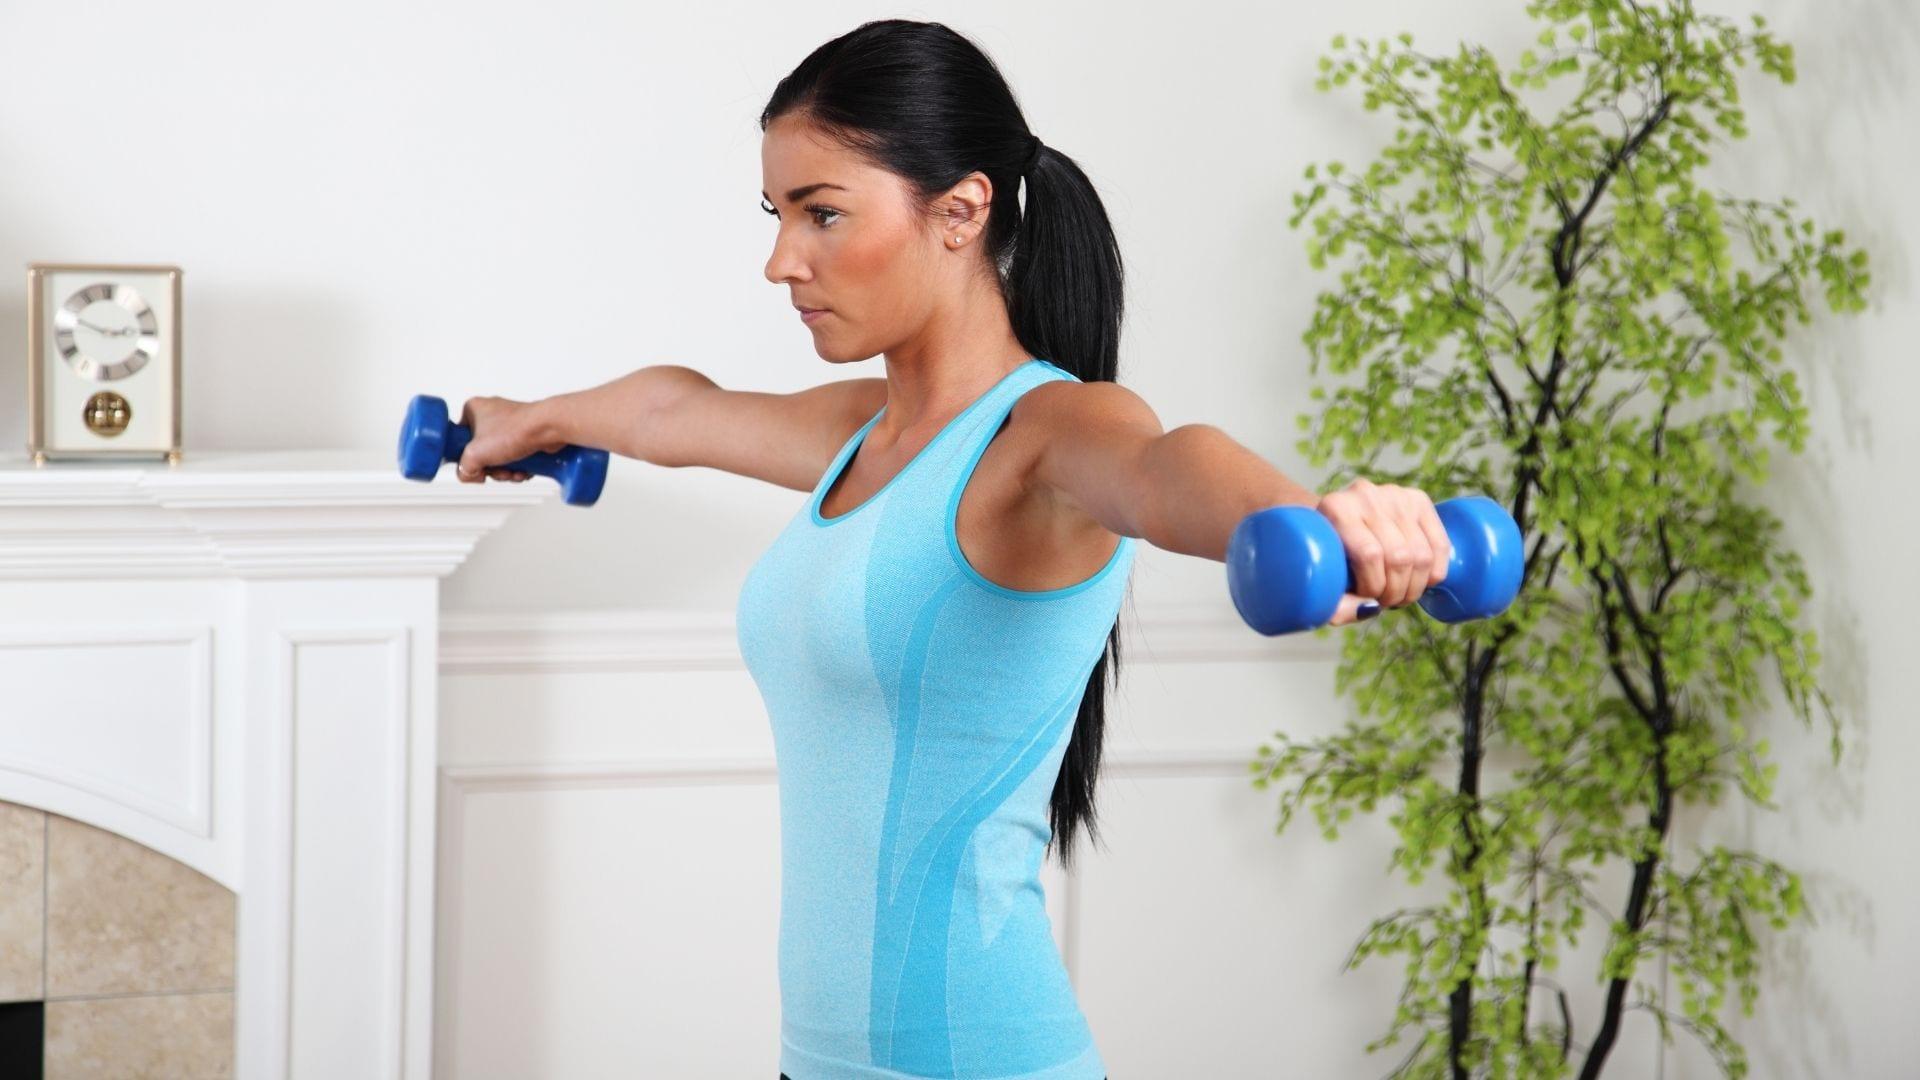 woman exercising and lifting weights